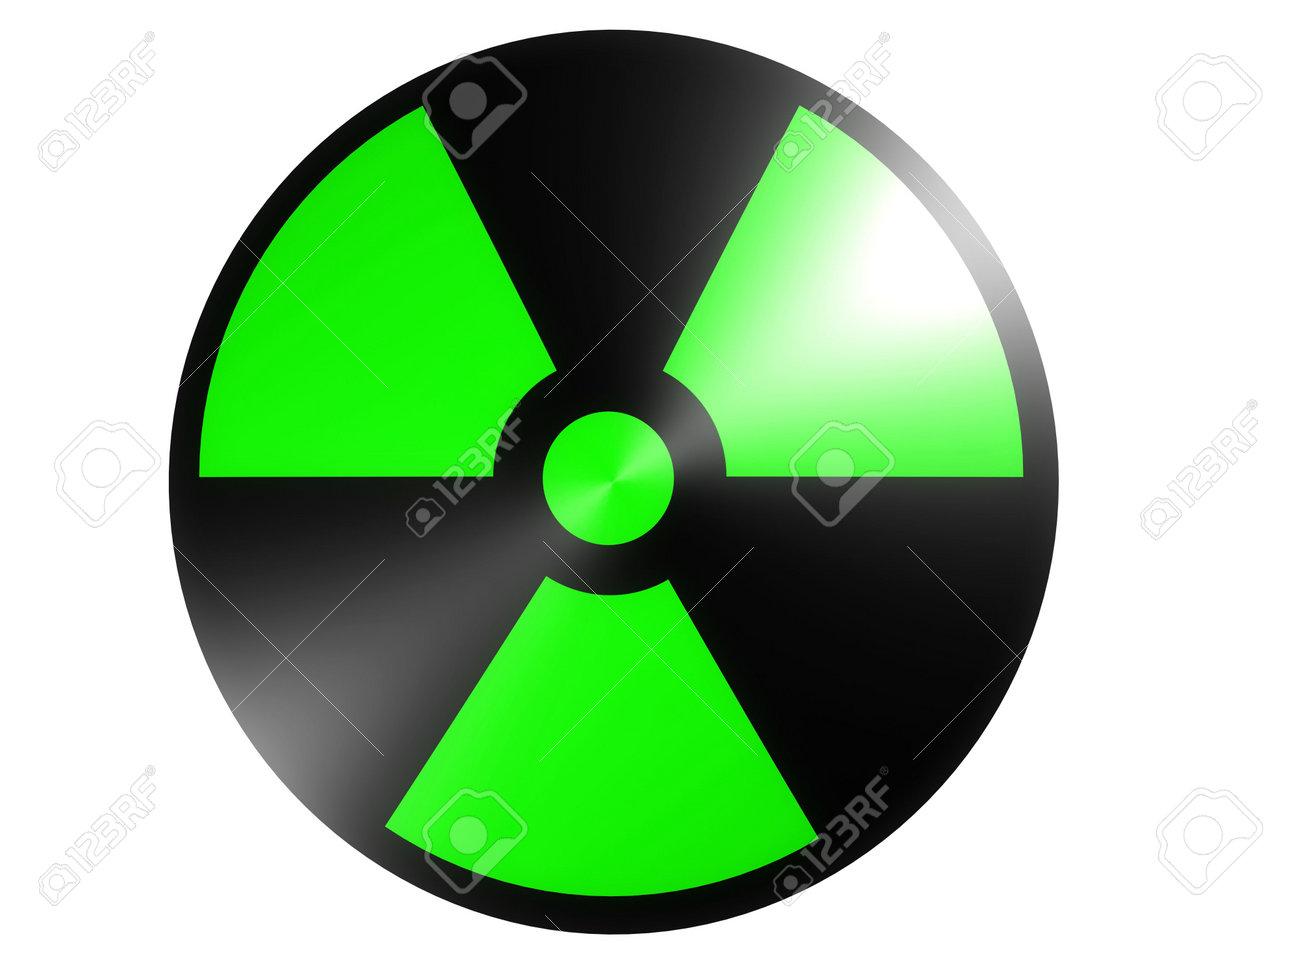 radioactive sign Stock Photo - 543513